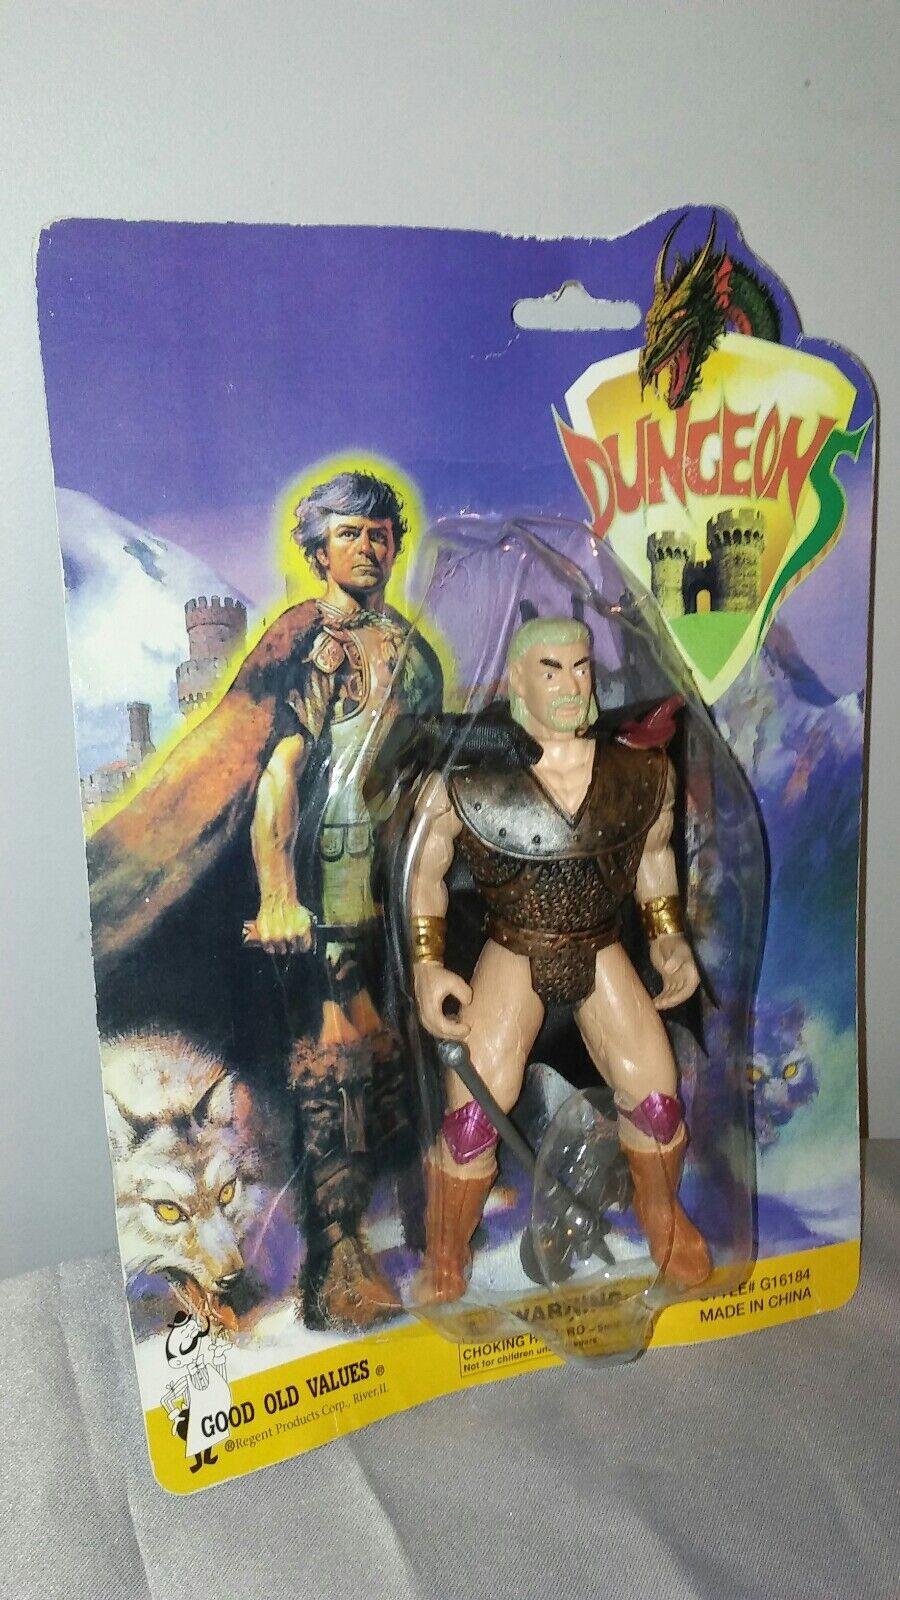 Vintage dungeons dungeons dungeons Ko Figure Motu He man Galaxy Warrior wrestler Moc figure rare 8ec1e4